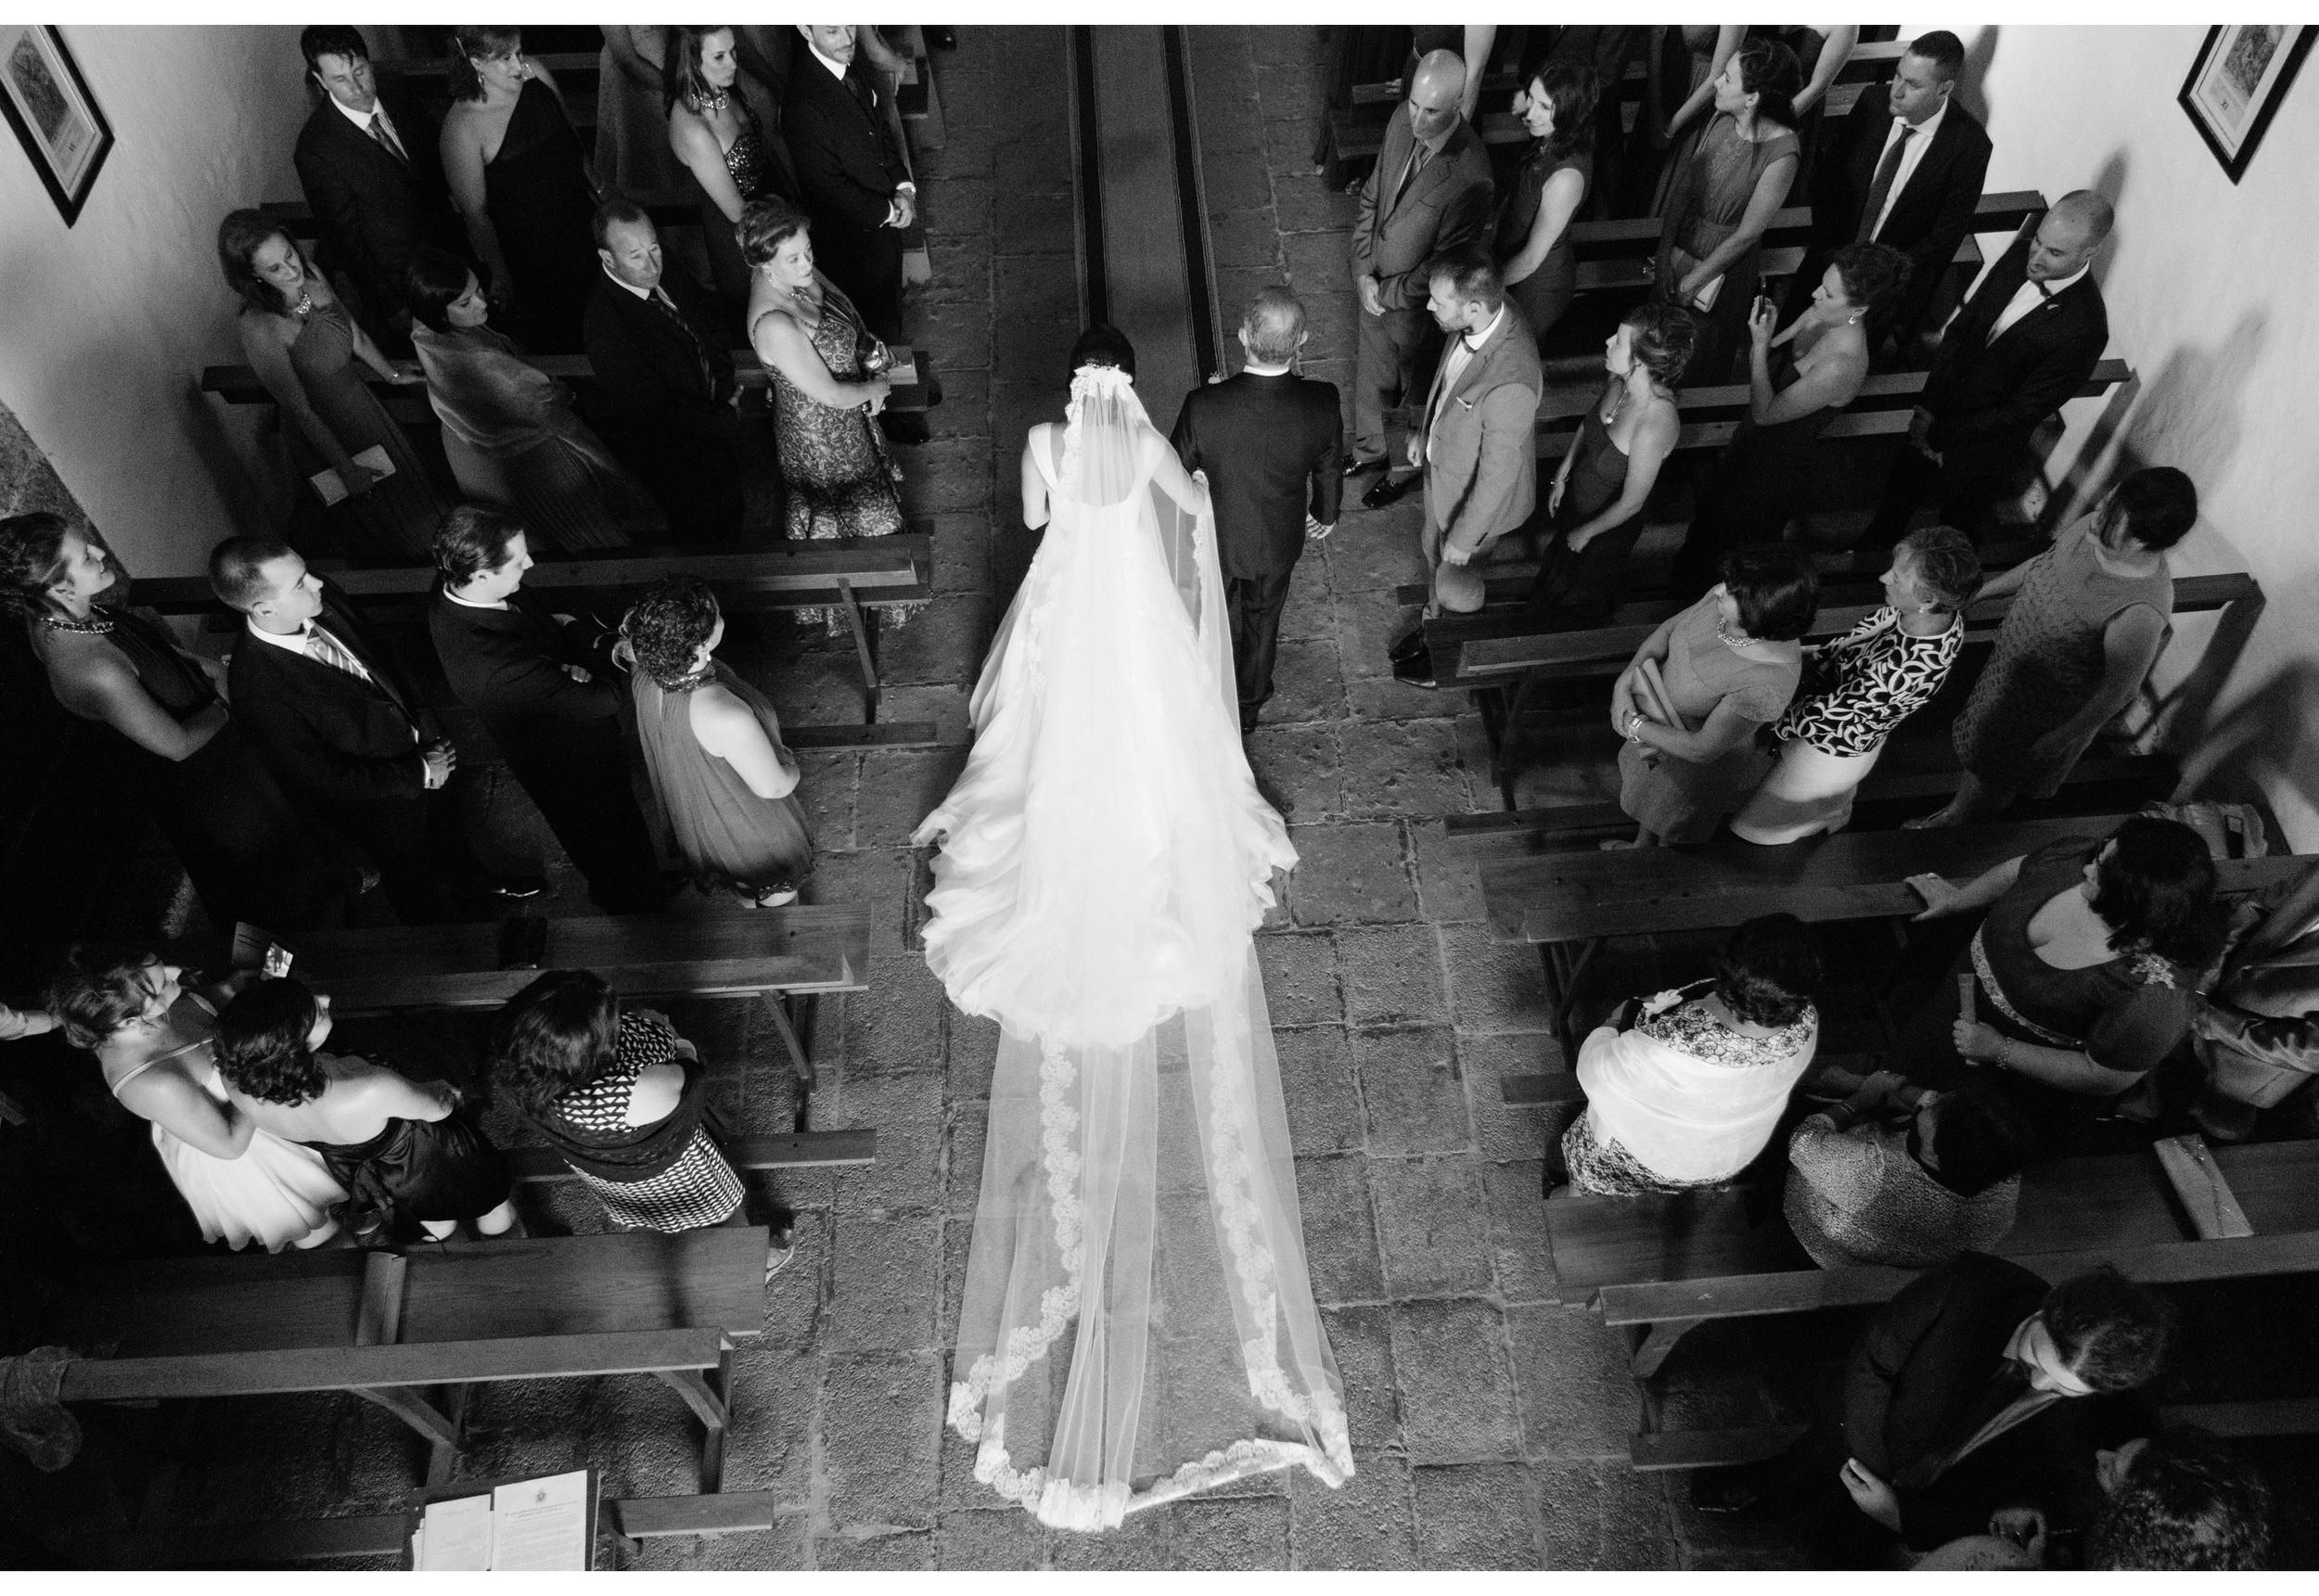 boda lanzarote 009.jpg